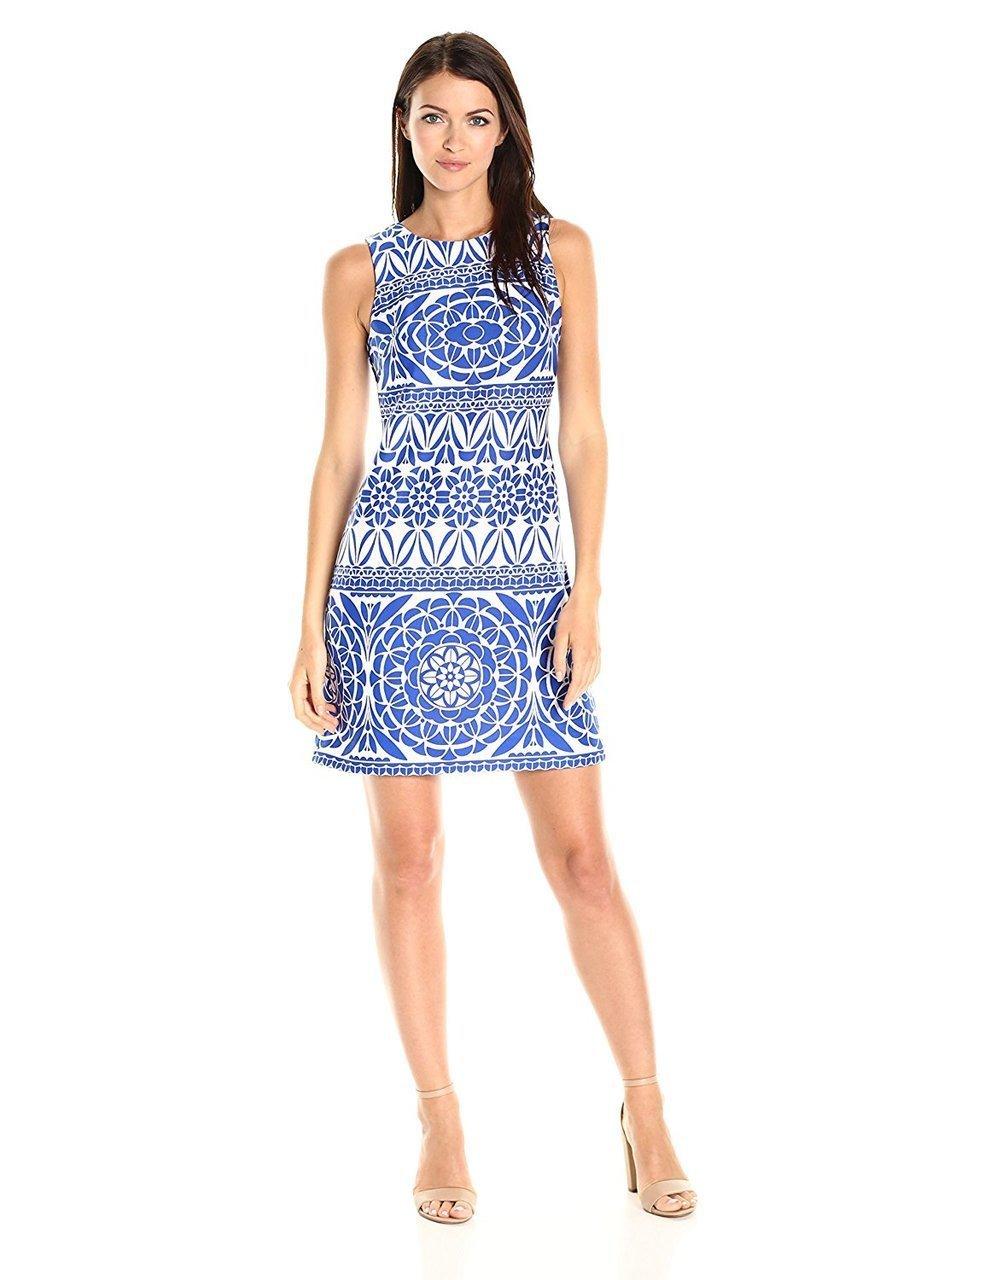 Taylor - 9174MJ Printed Jewel Neck A-line Dress